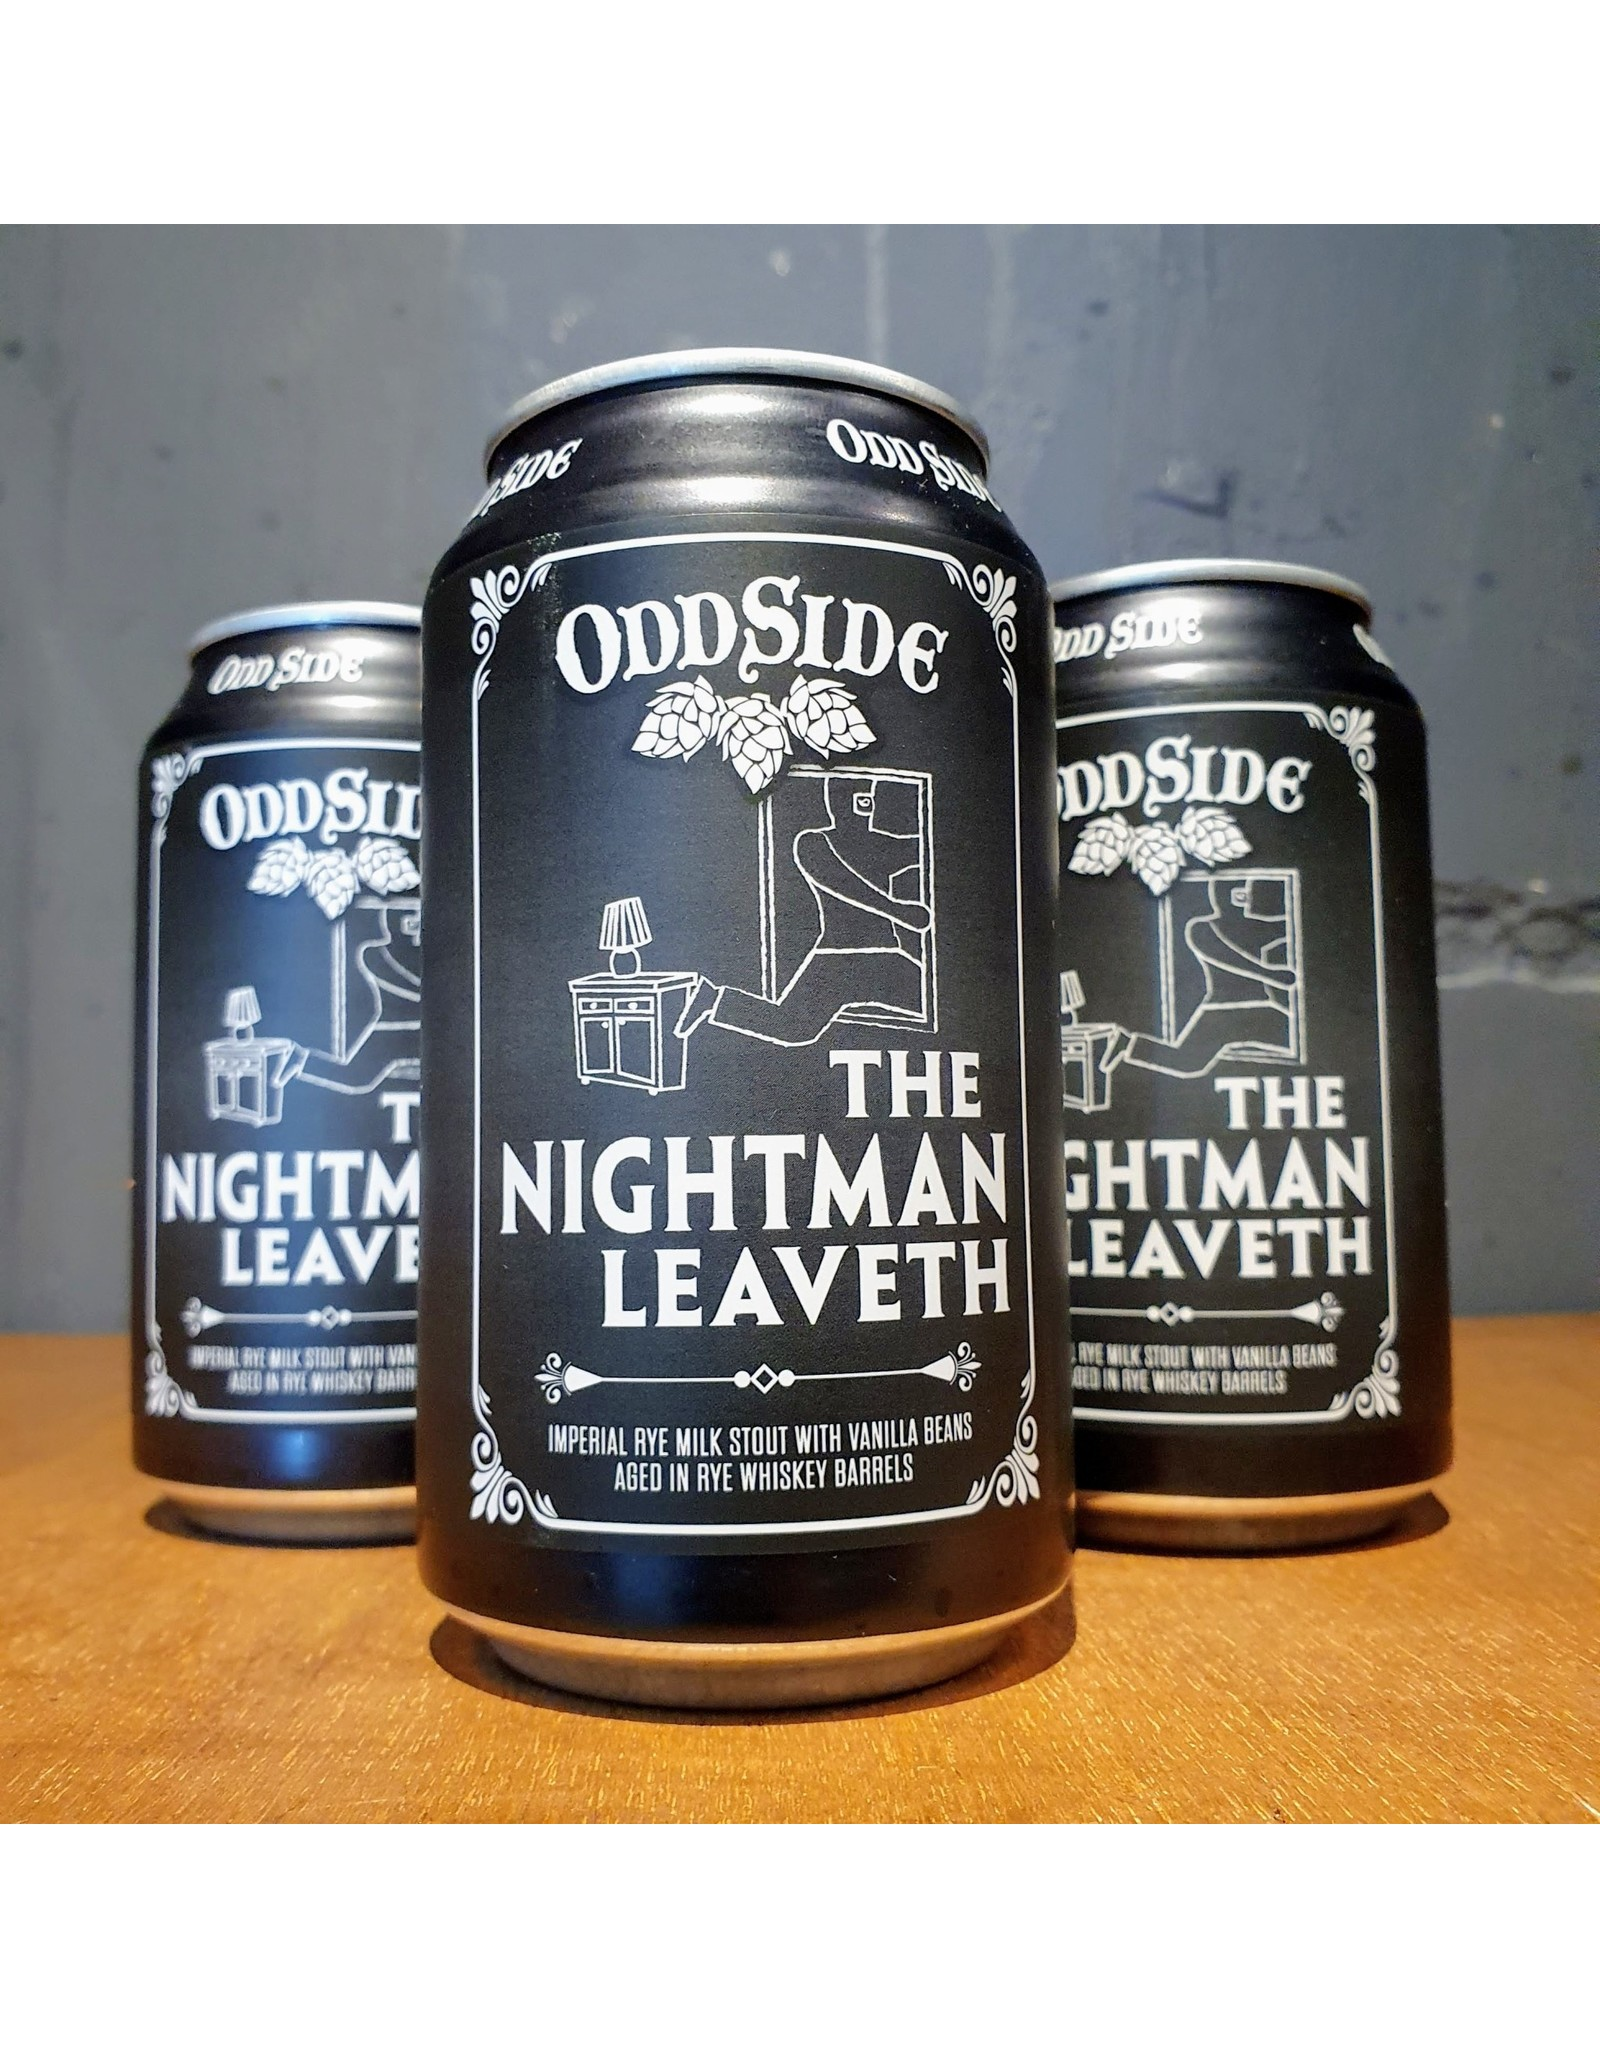 Odd Side Ales: The Nightman Leaveth